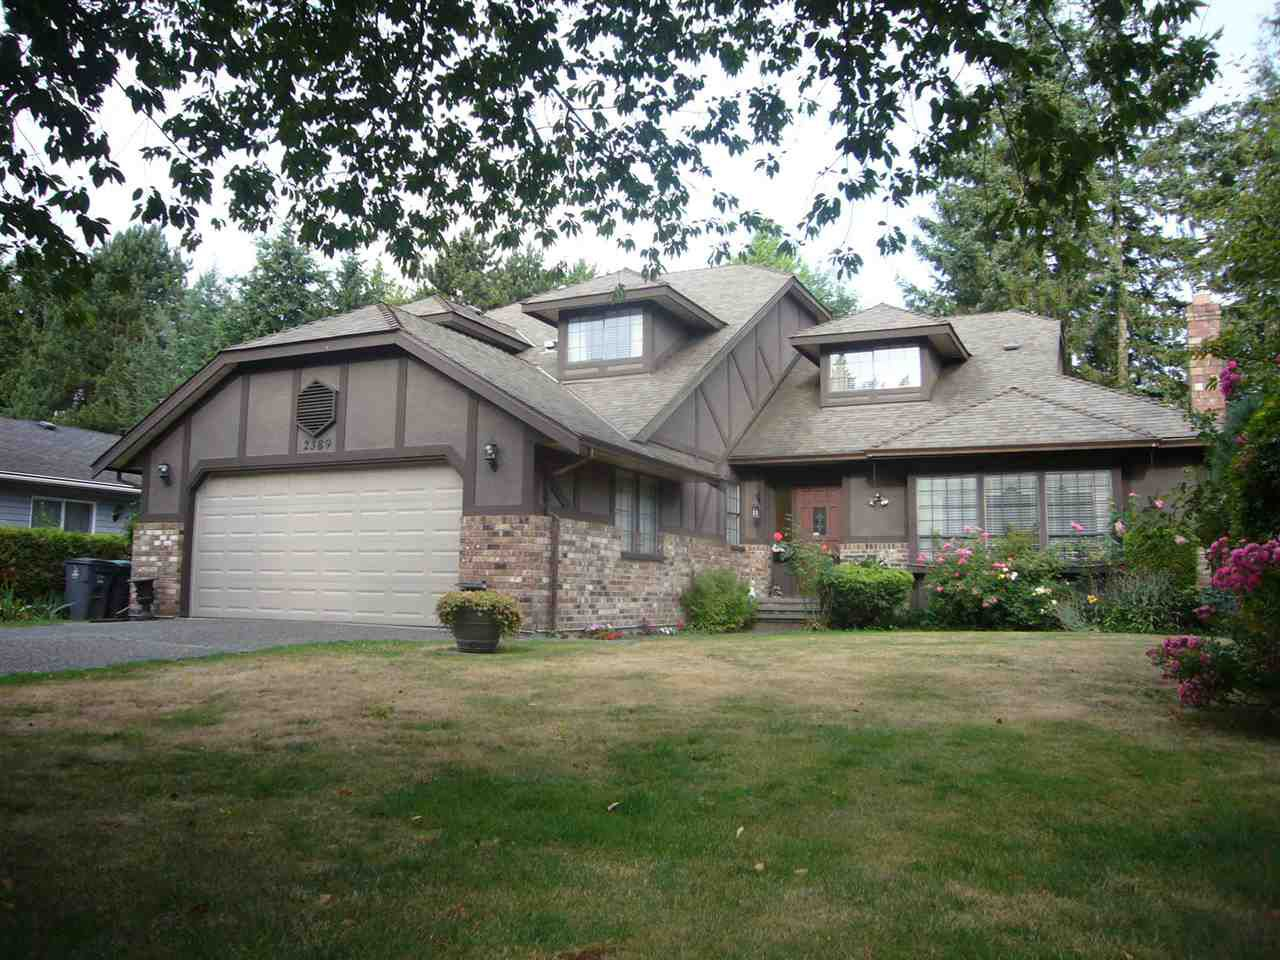 Main Photo: 2389 150B Street in Surrey: Sunnyside Park Surrey House for sale (South Surrey White Rock)  : MLS®# R2289995